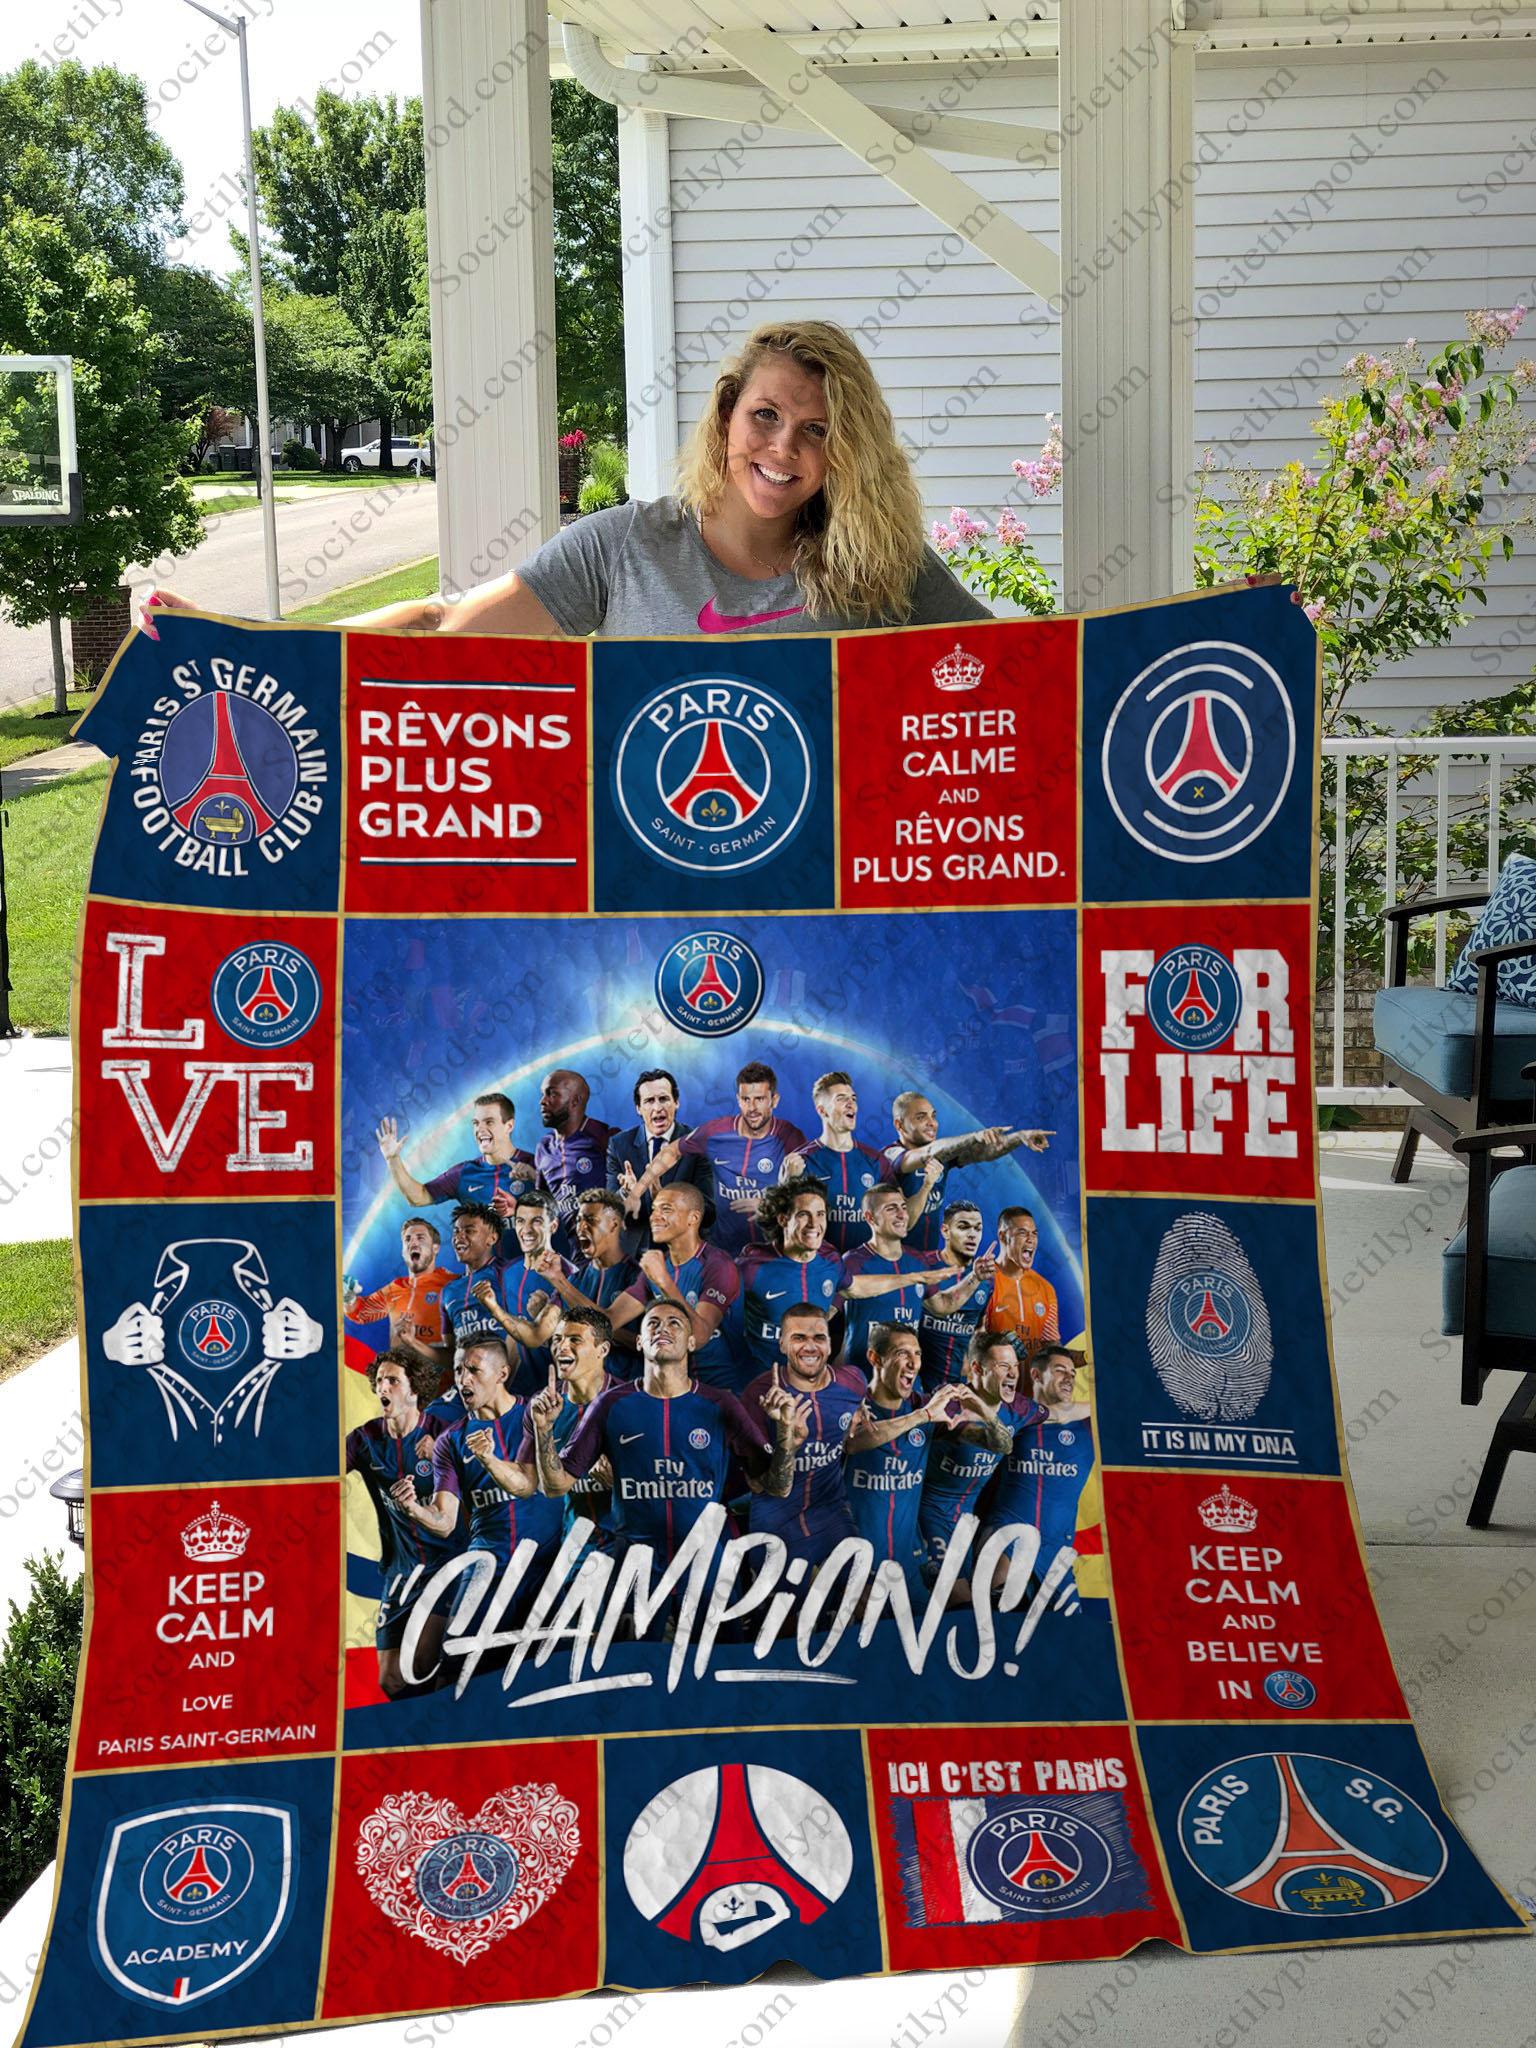 paris saint-germain football club full printing quilt 1